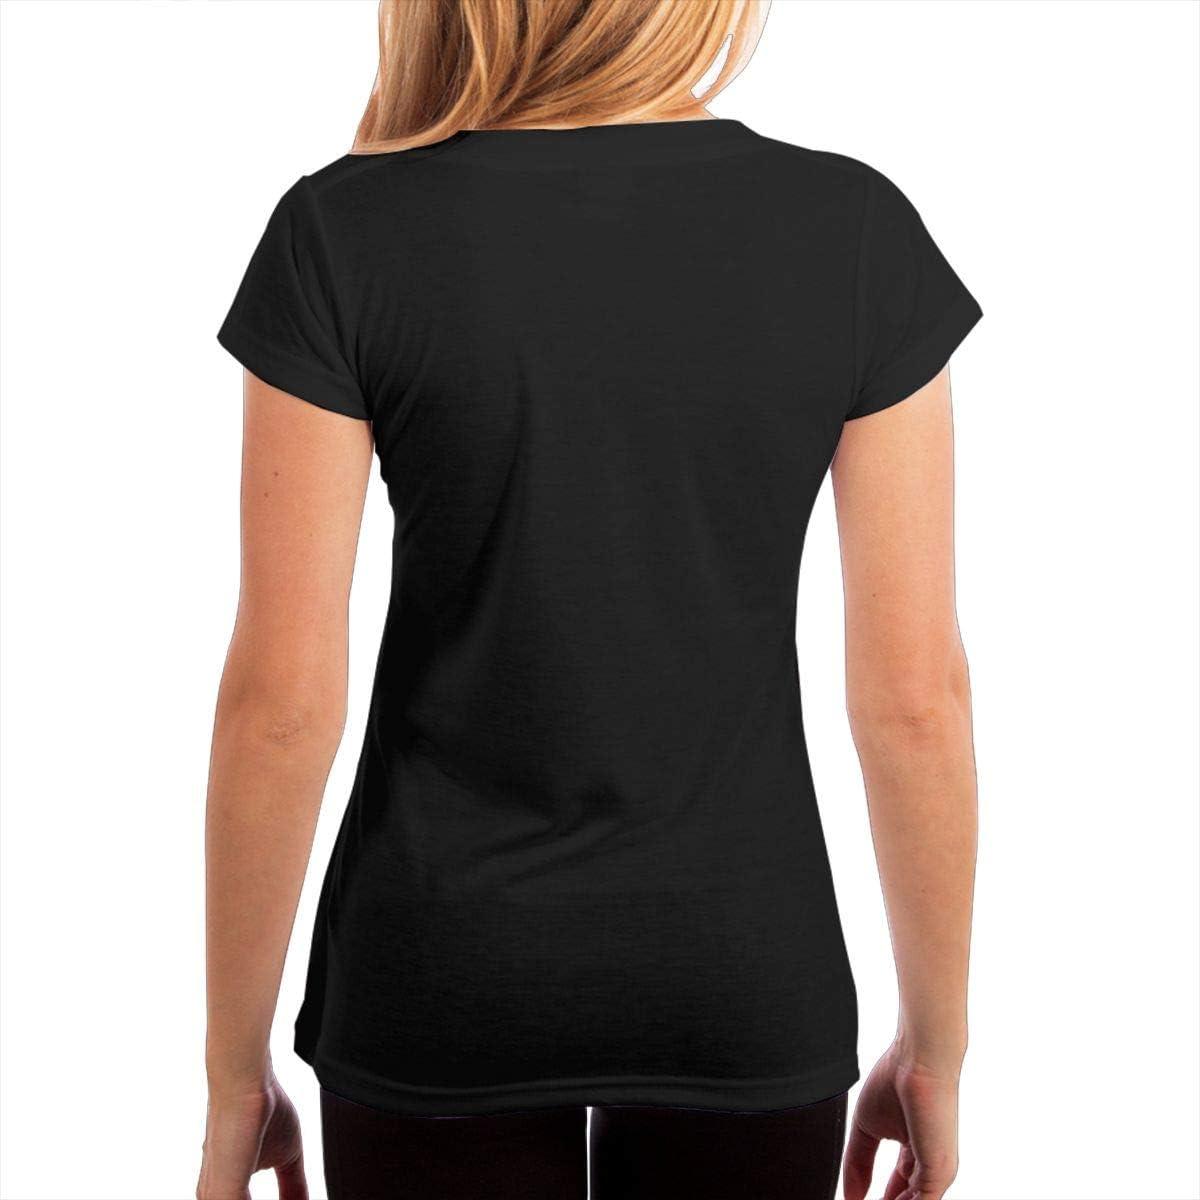 NaohBent Adam The Ants Womans V Collar T-Shirts Black